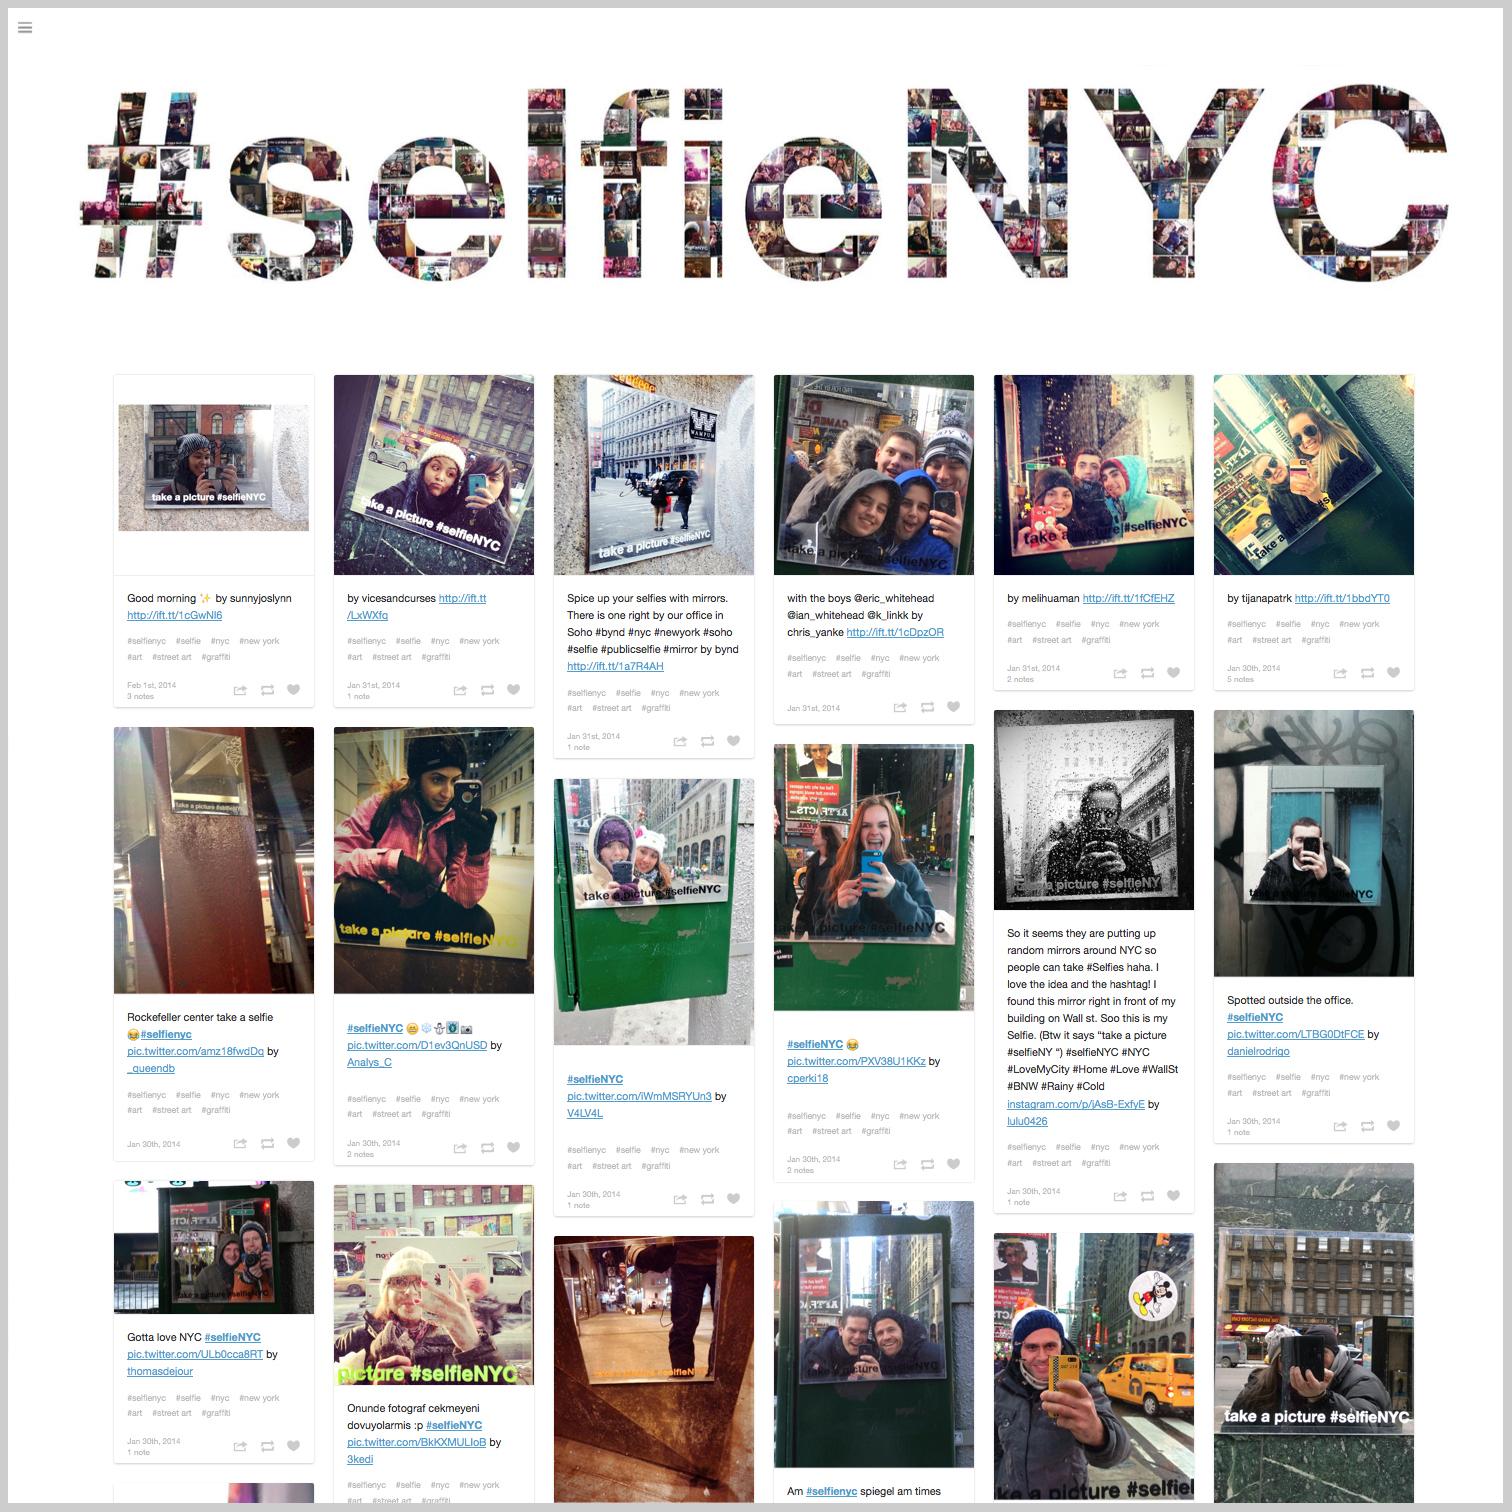 #selfieNYC